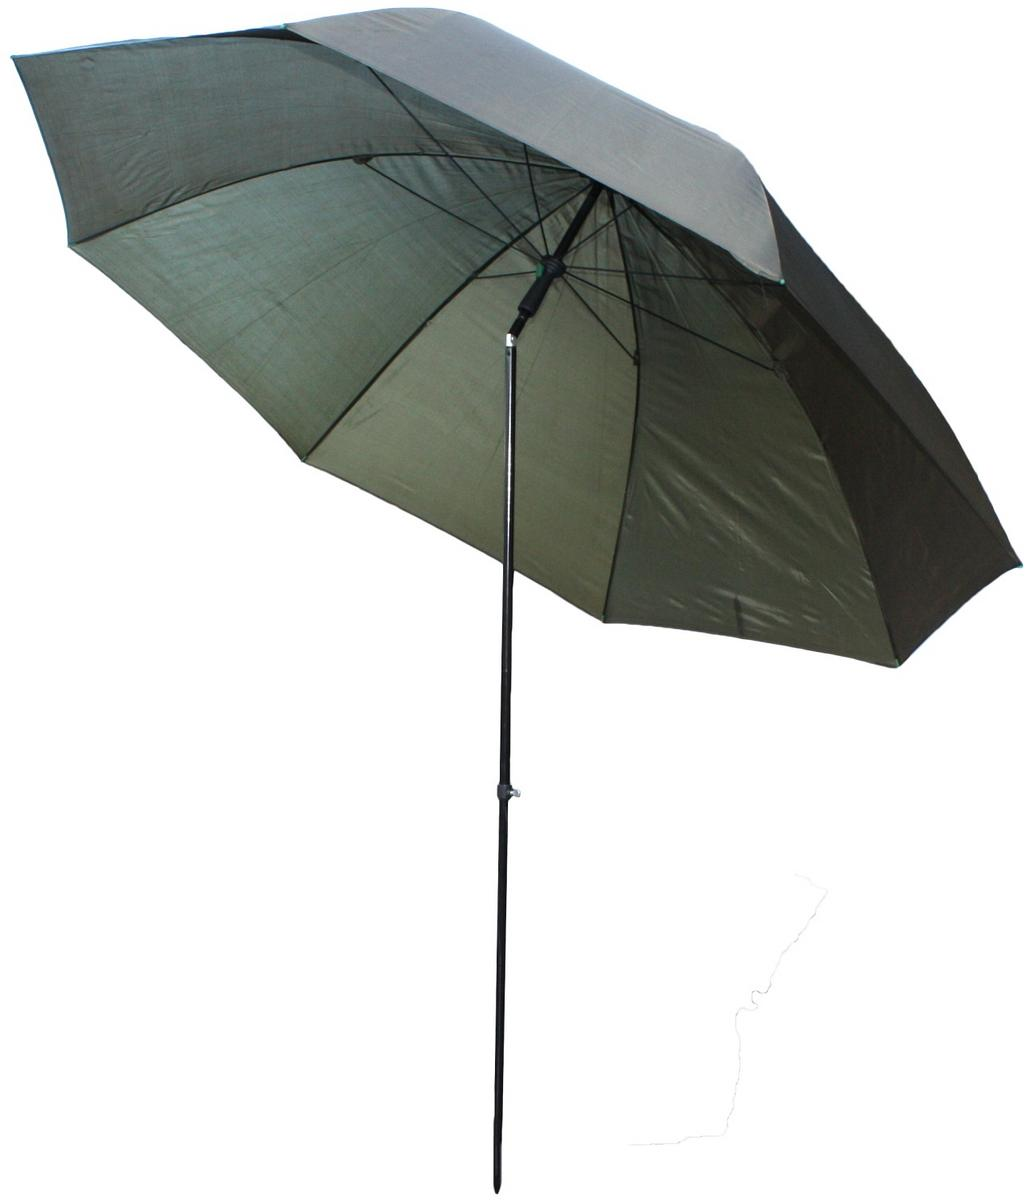 Michigan Fishing Umbrella With Sides And Windows